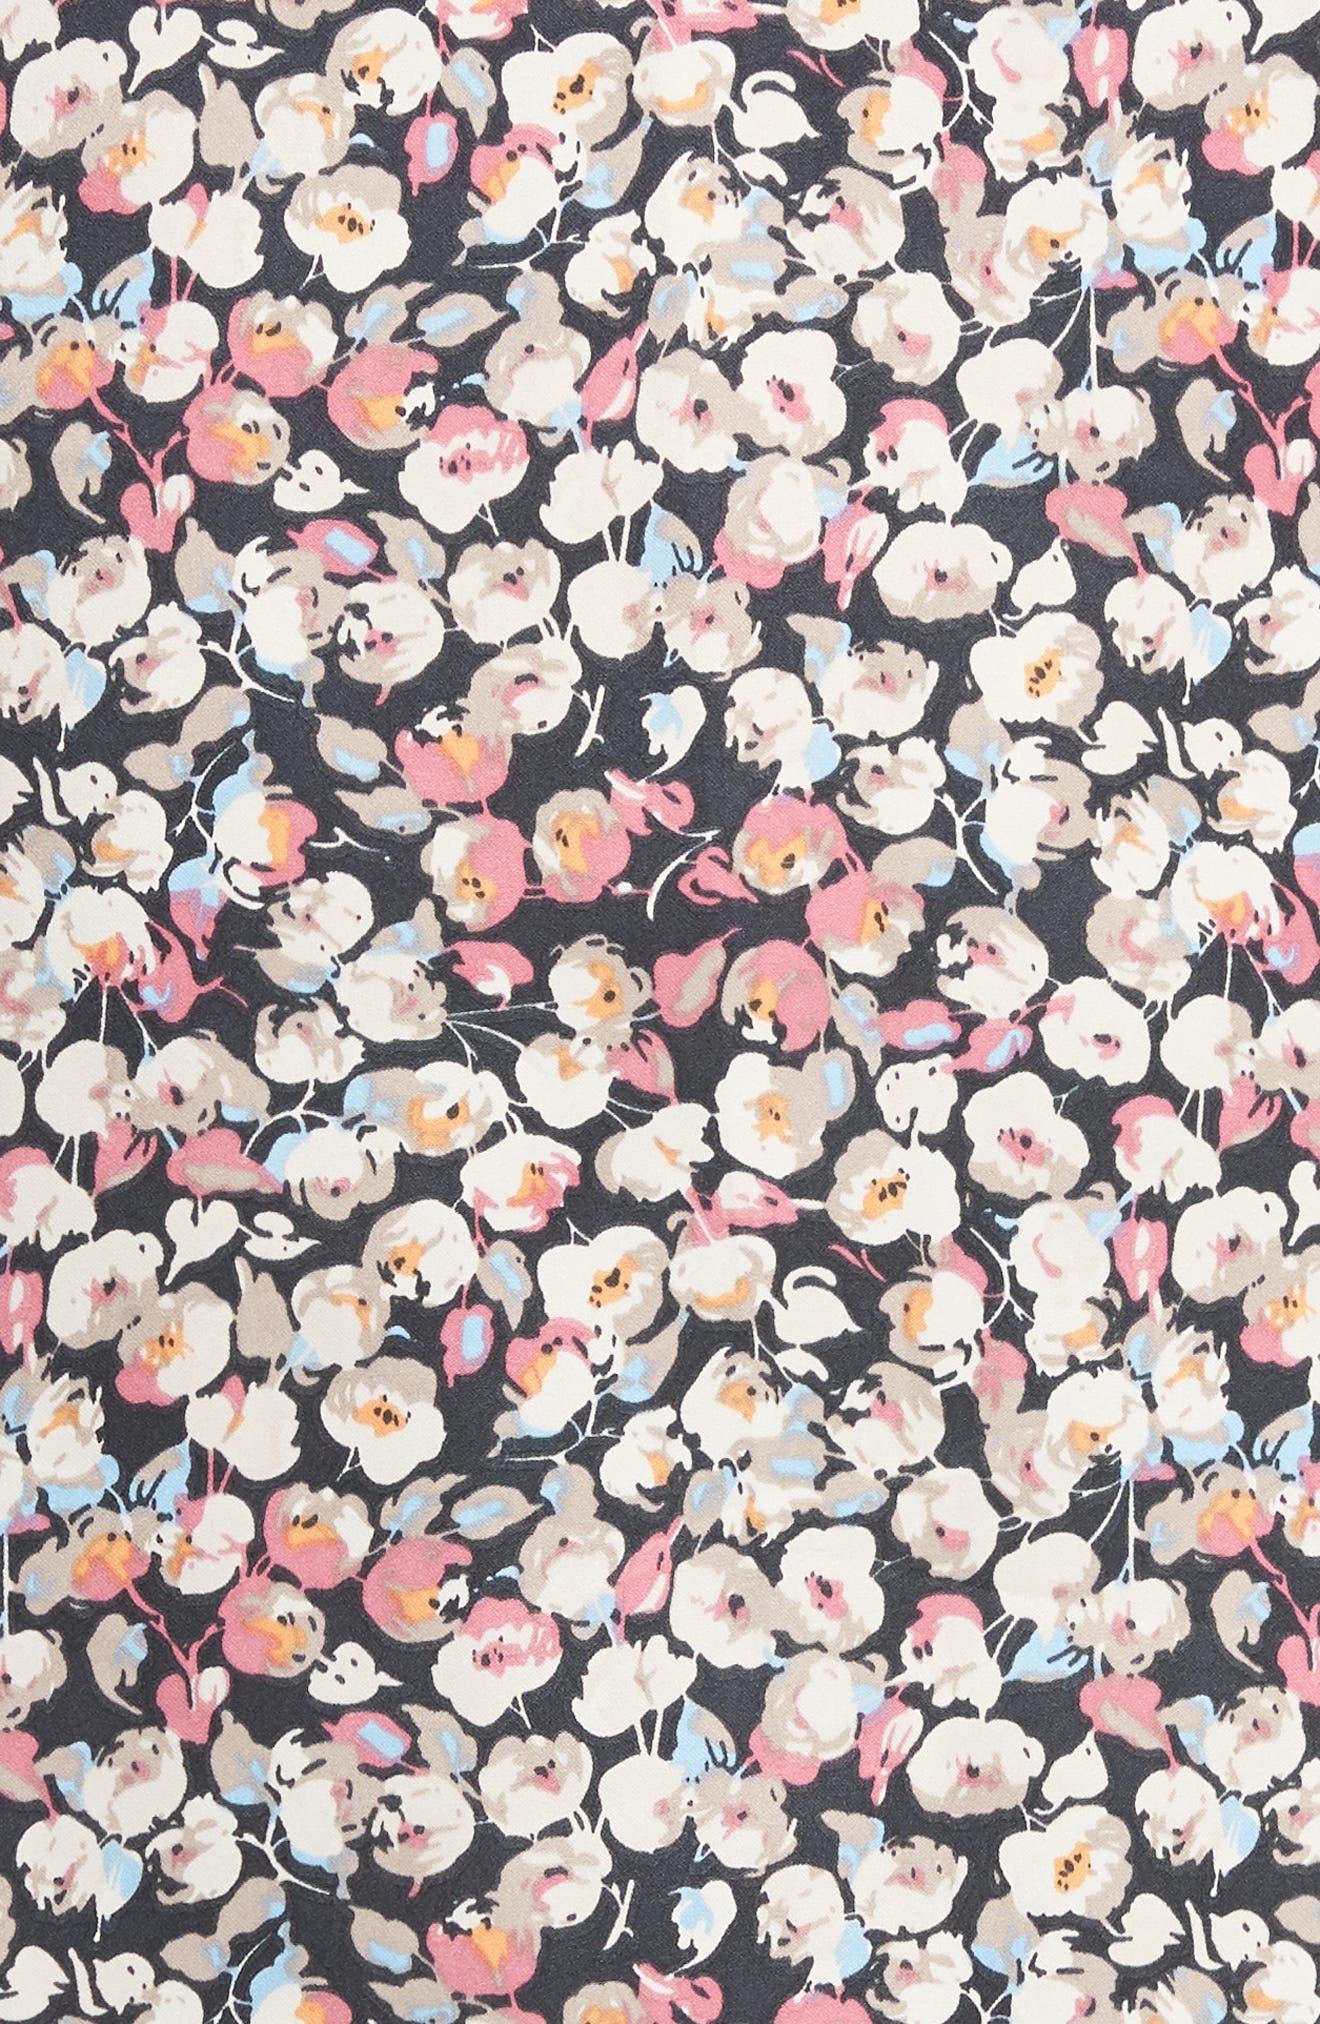 Floral Blouson Sleeve Blouse,                             Alternate thumbnail 6, color,                             B244n Mauve